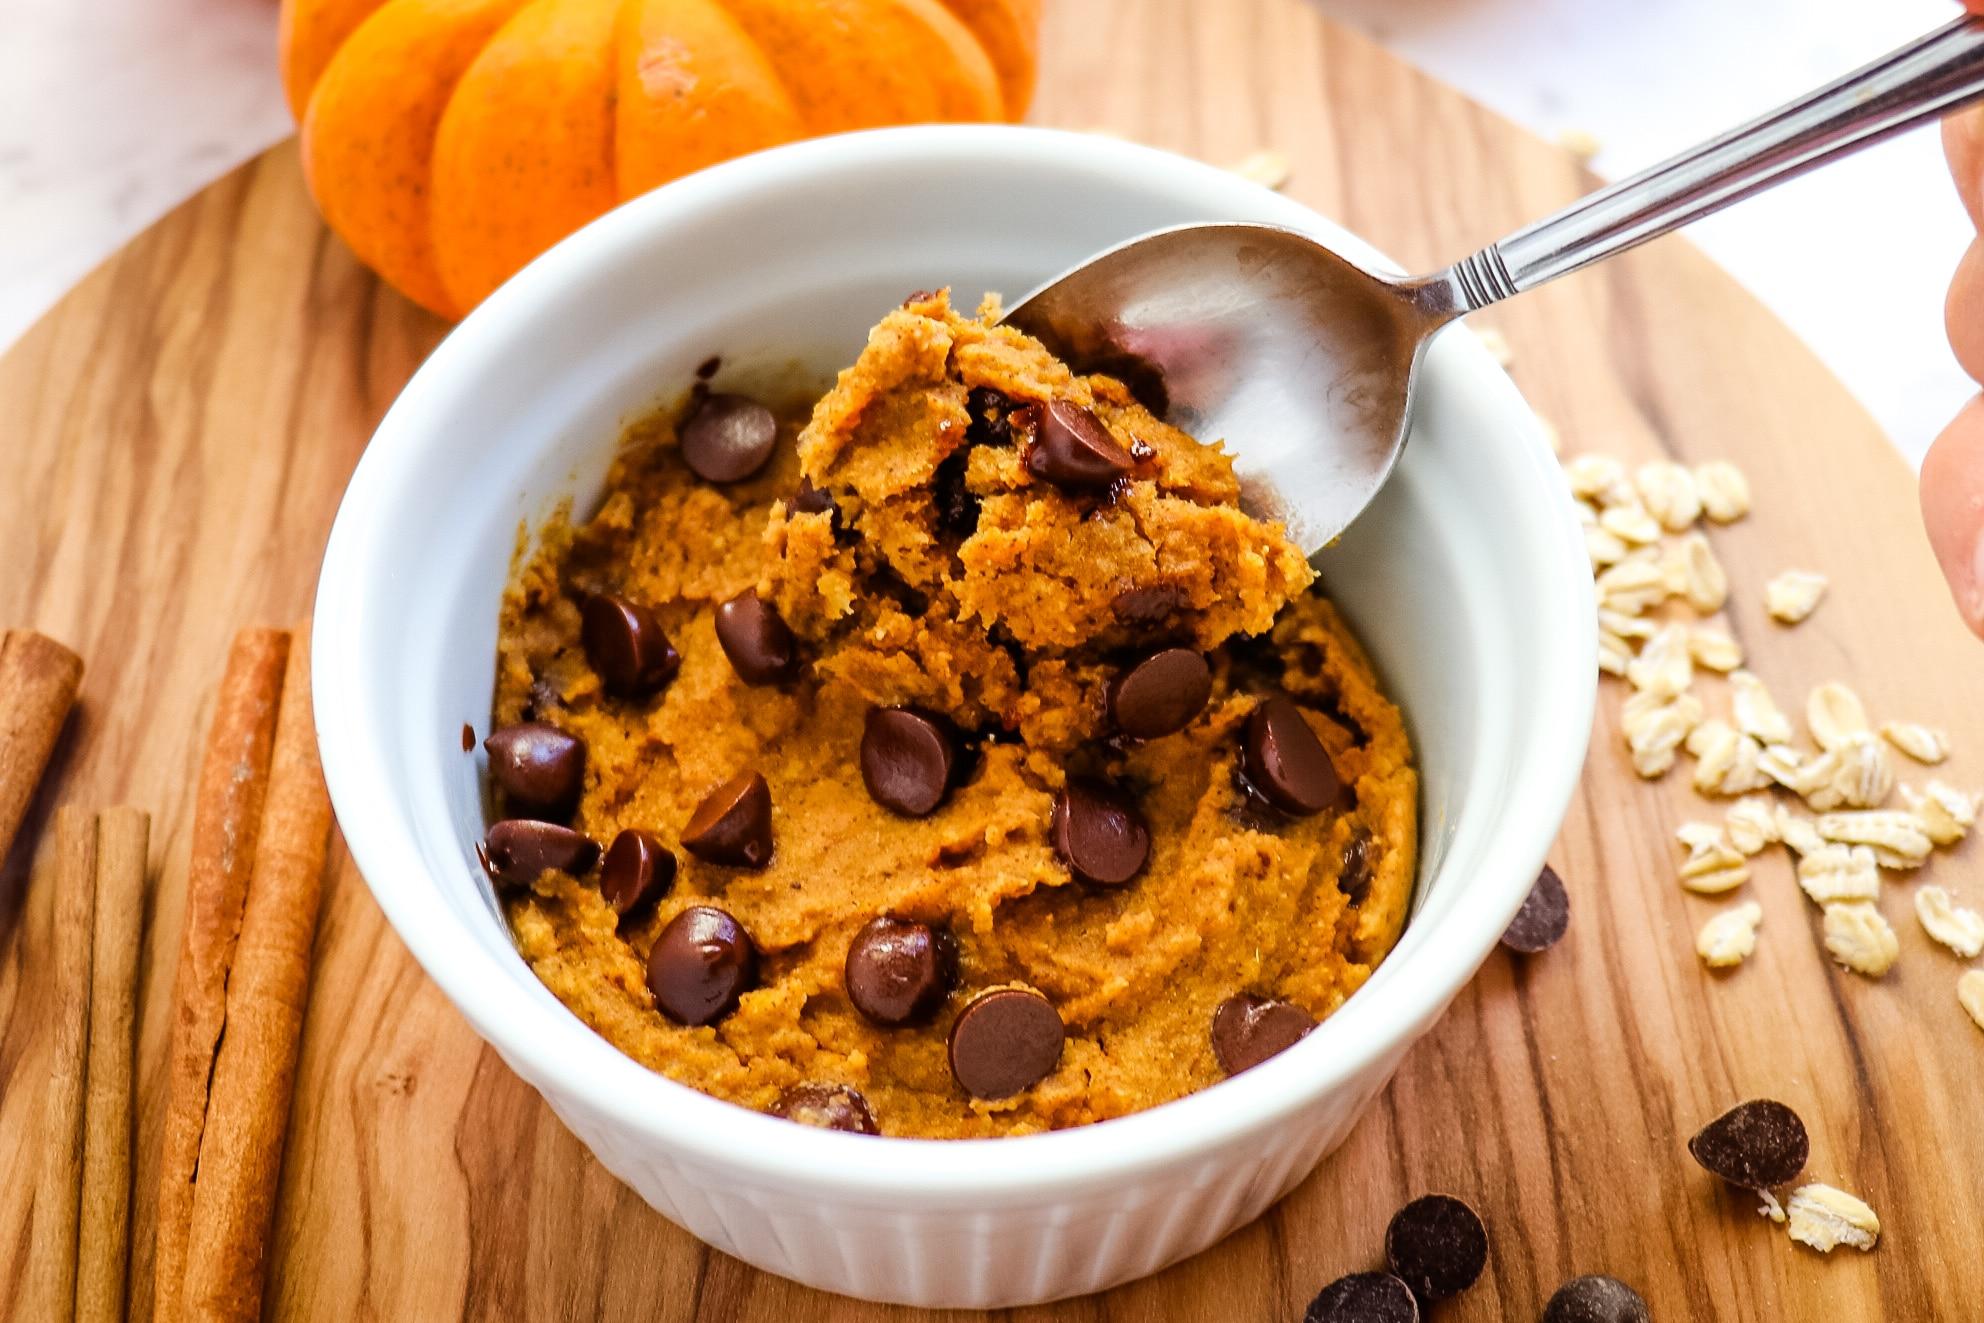 Healthy Pumpkin Mug Cake | 1-Minute Microwave Recipe!